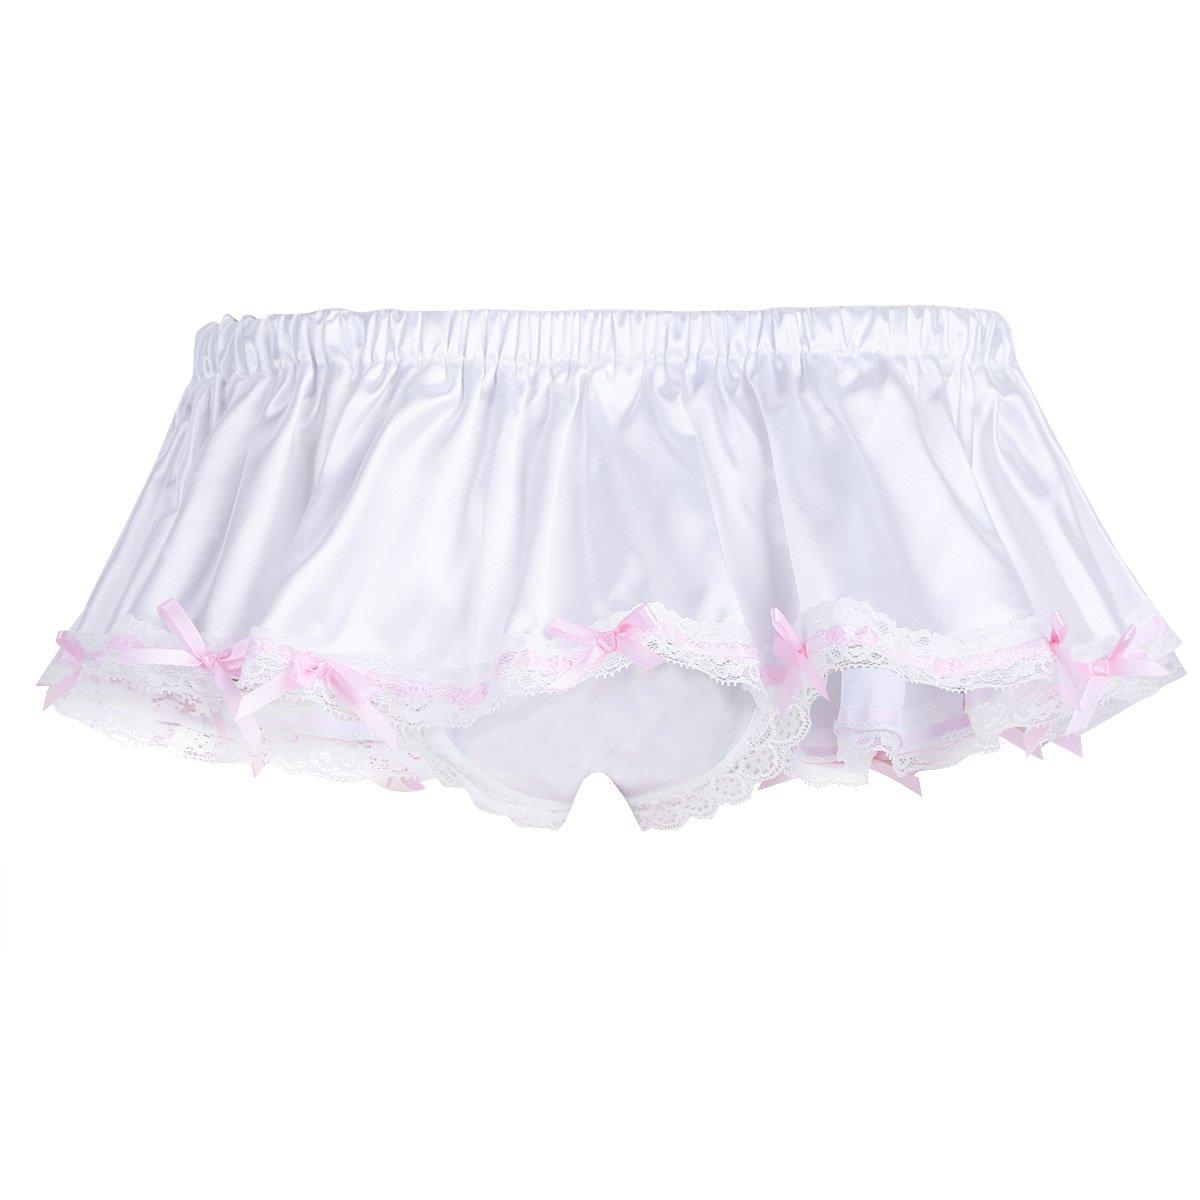 MSemis Men's Sissy Skirted Panties Satin Frilly Lace Briefs Thongs Underwear Crossdress